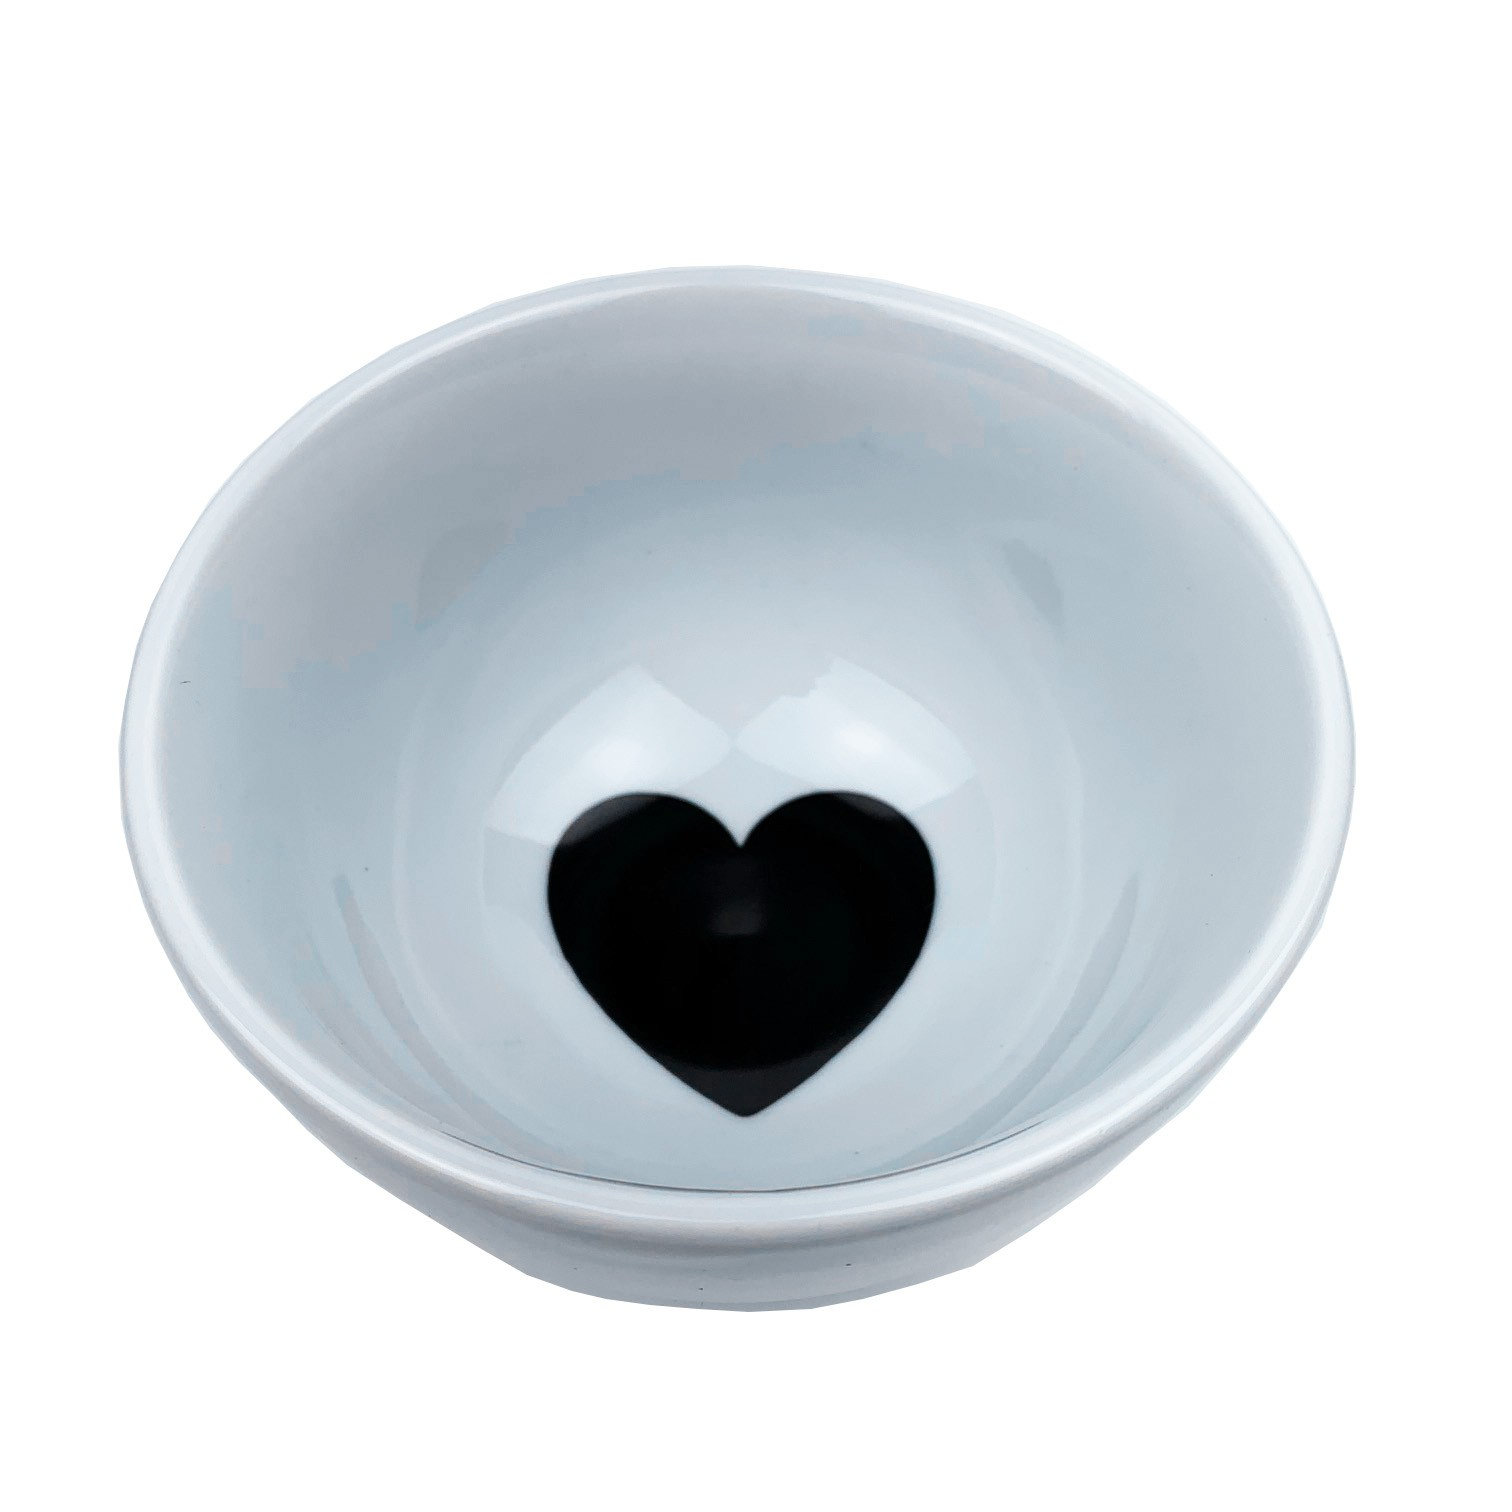 Bowl 500ml Black Heart